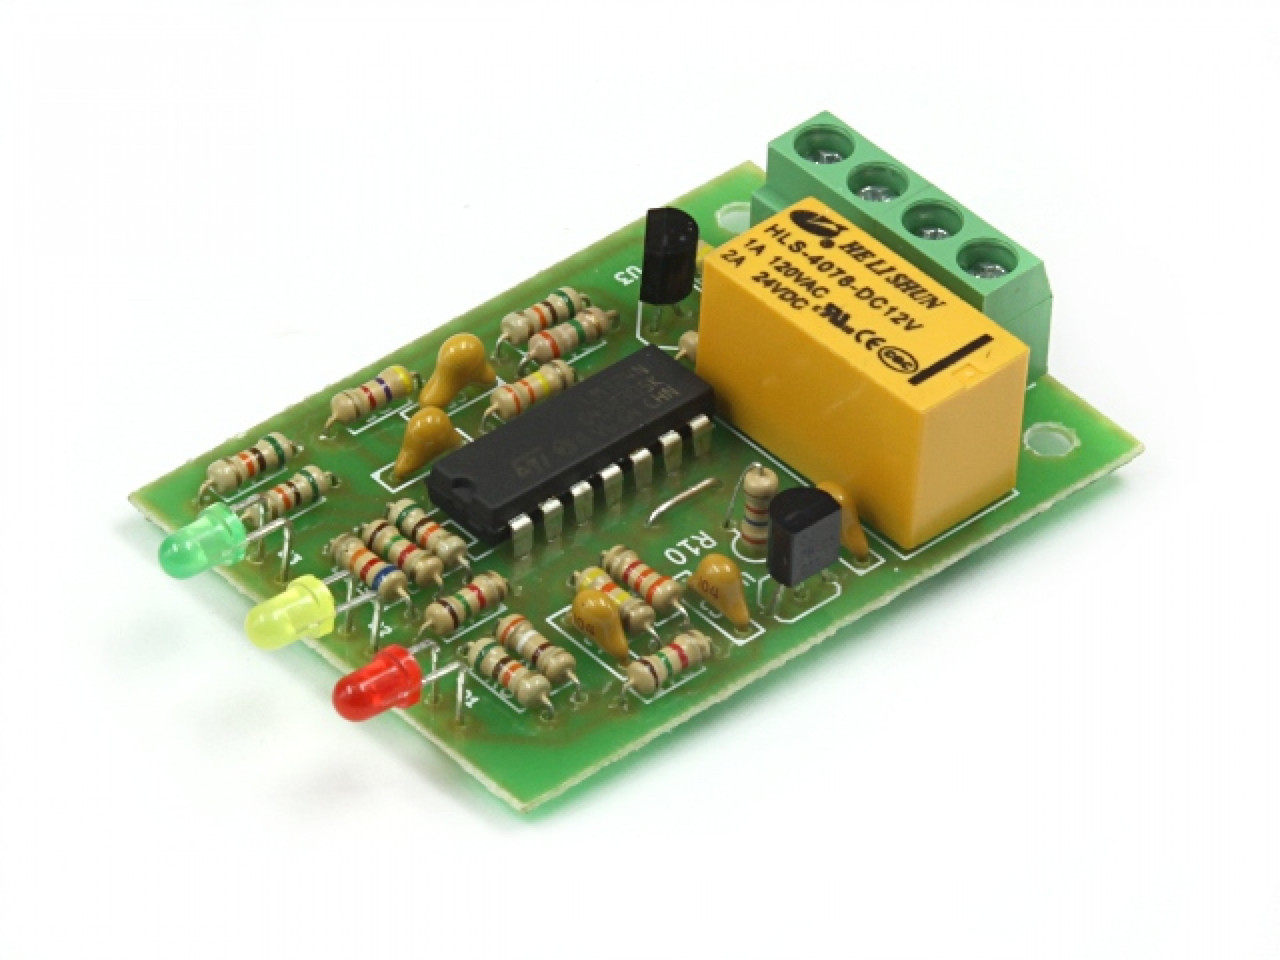 Радиоконструктор автомобільний емулятор лямбда-зонда K246